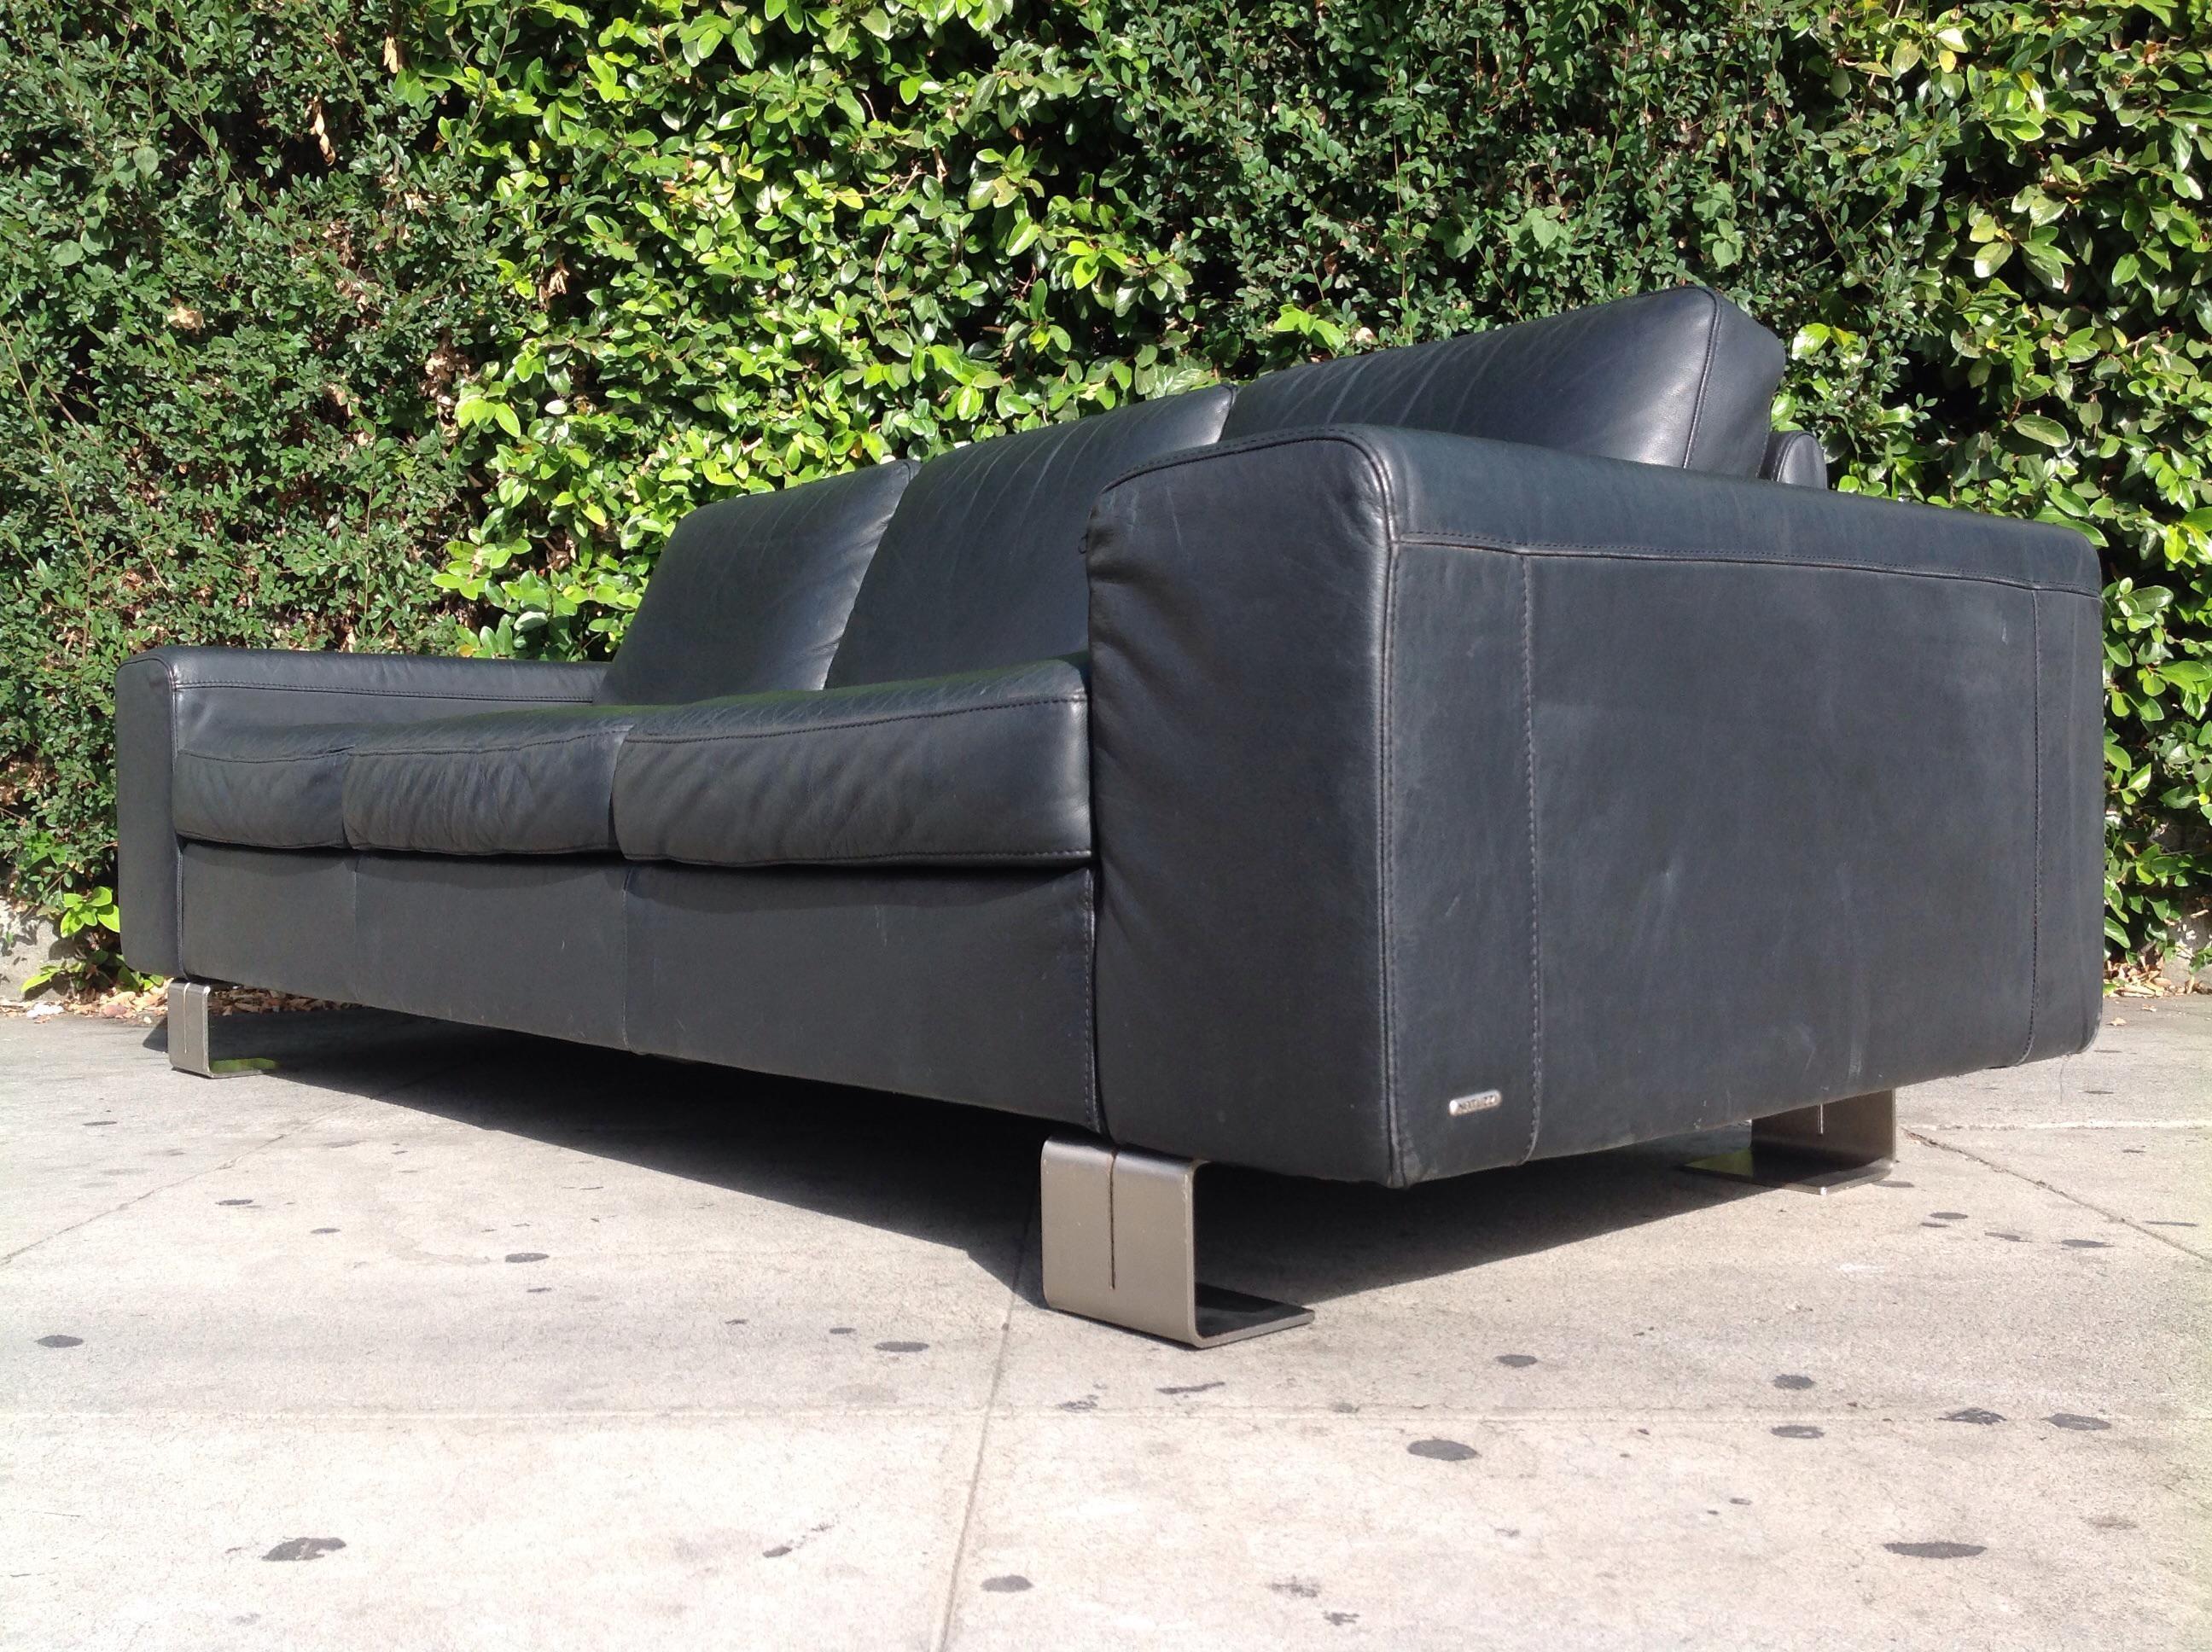 Natuzzi Modern Natuzzi Italia Leather Sofa With Metal Legs For Sale   Image  4 Of 6